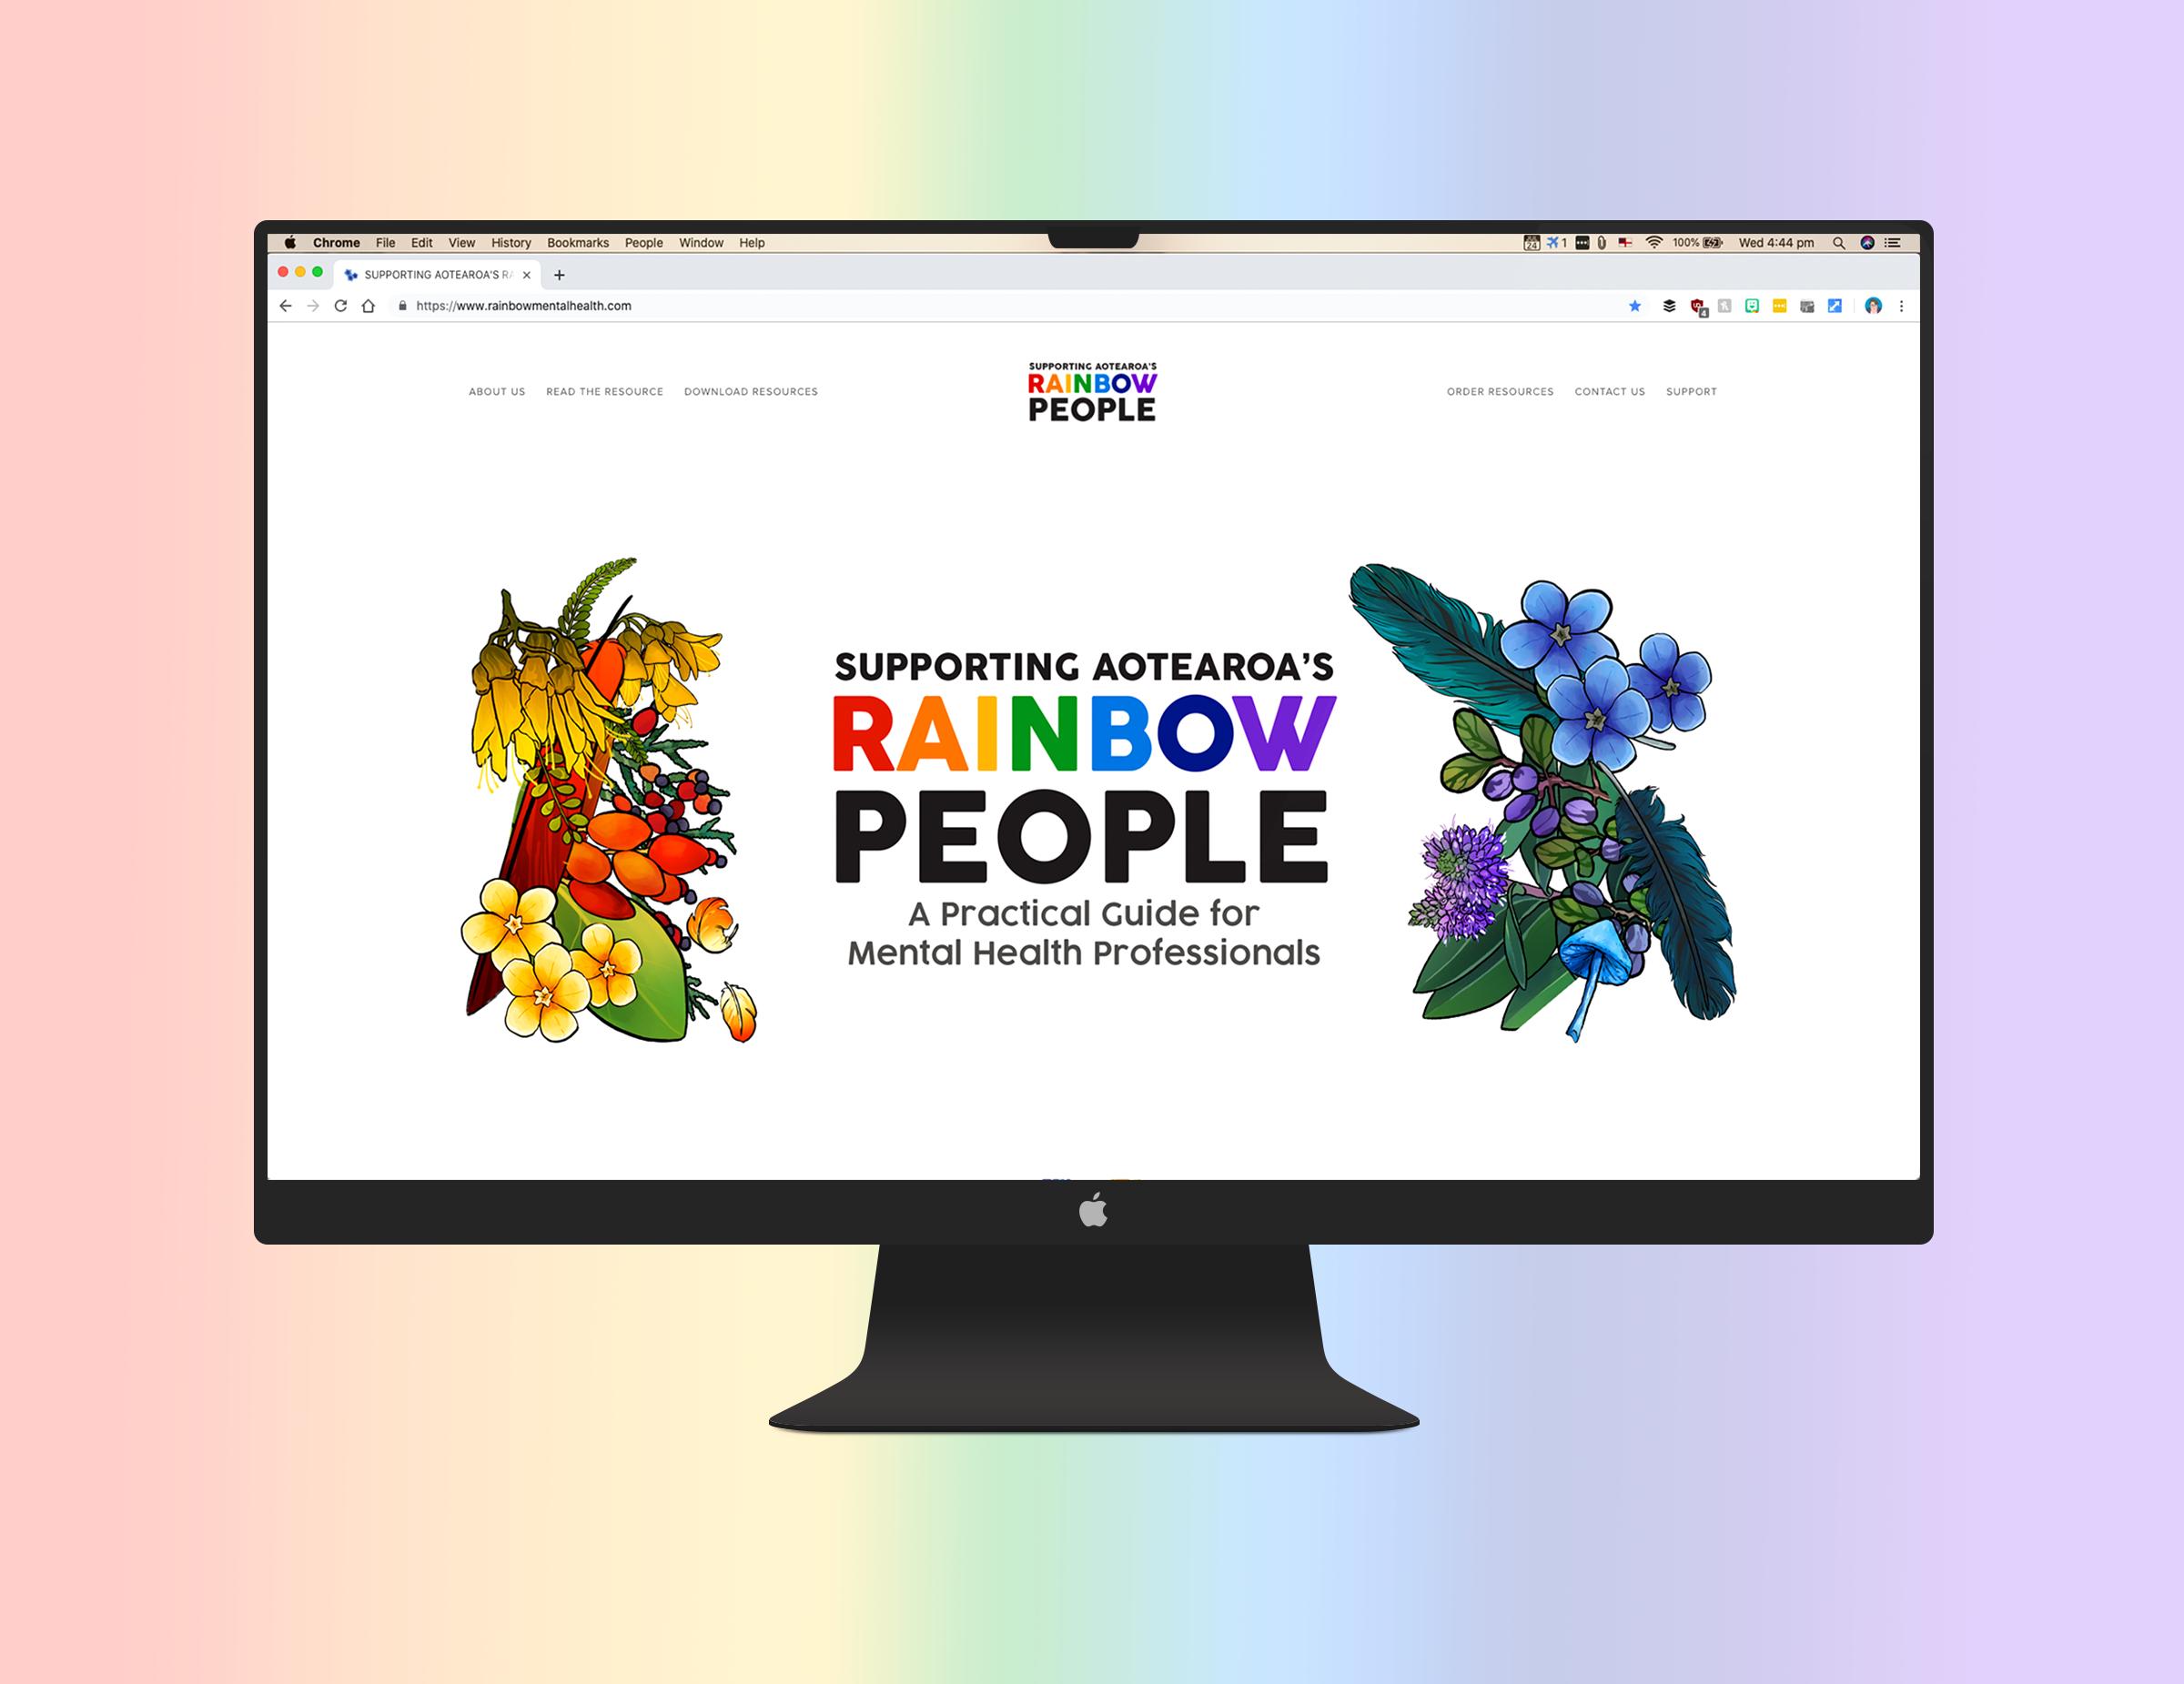 Supporting Aotearoa's Rainbow People